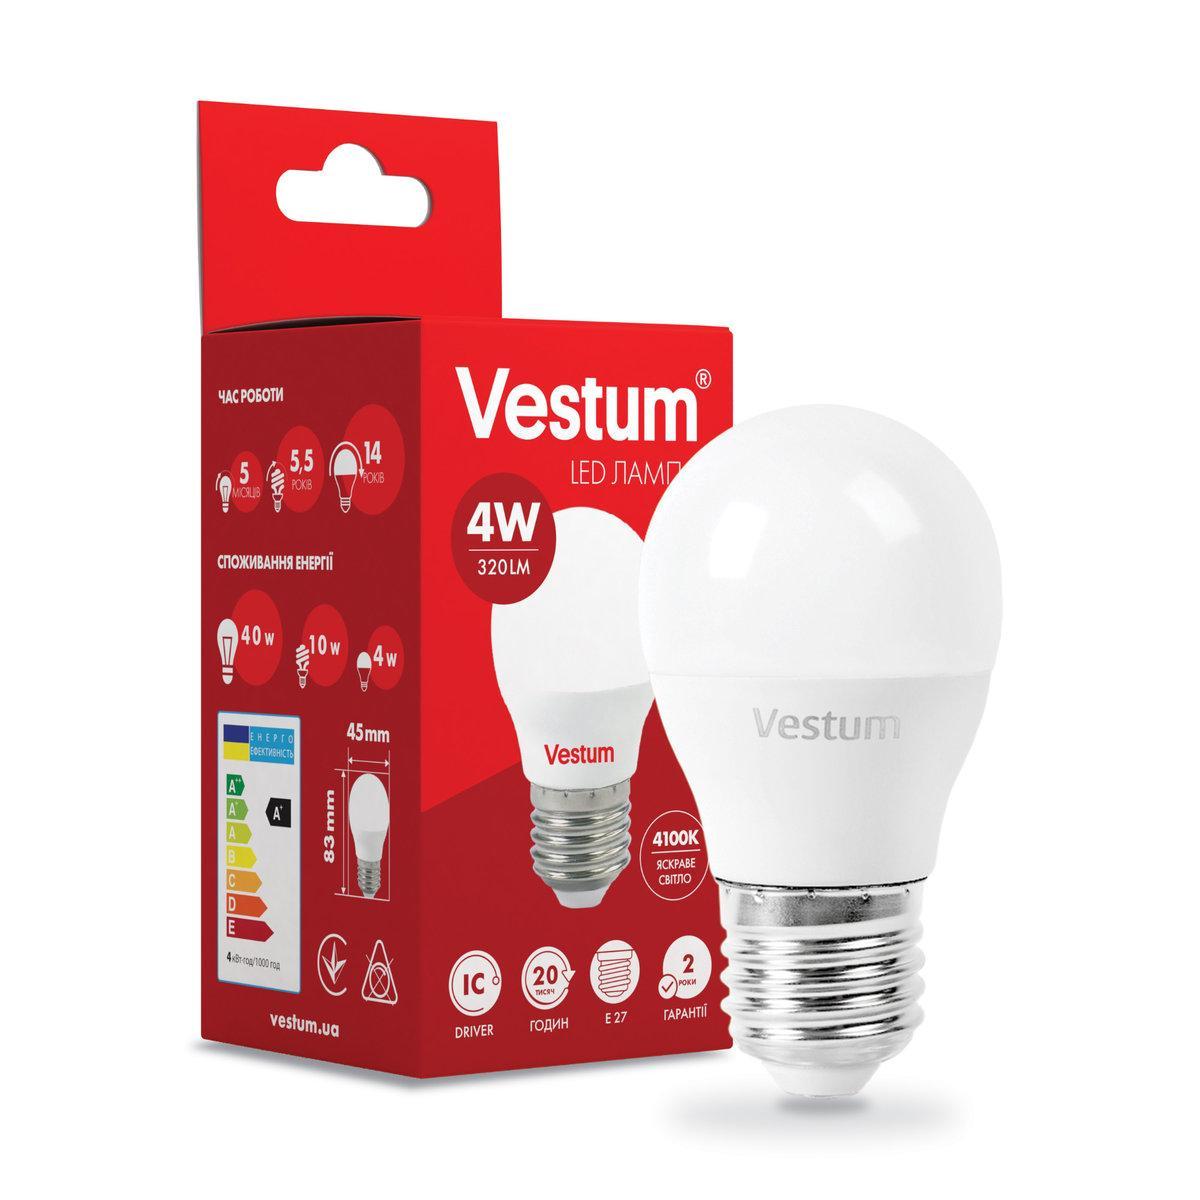 Светодиодная лампа Vestum G45 4W 4100K 220V E27 1-VS-1205